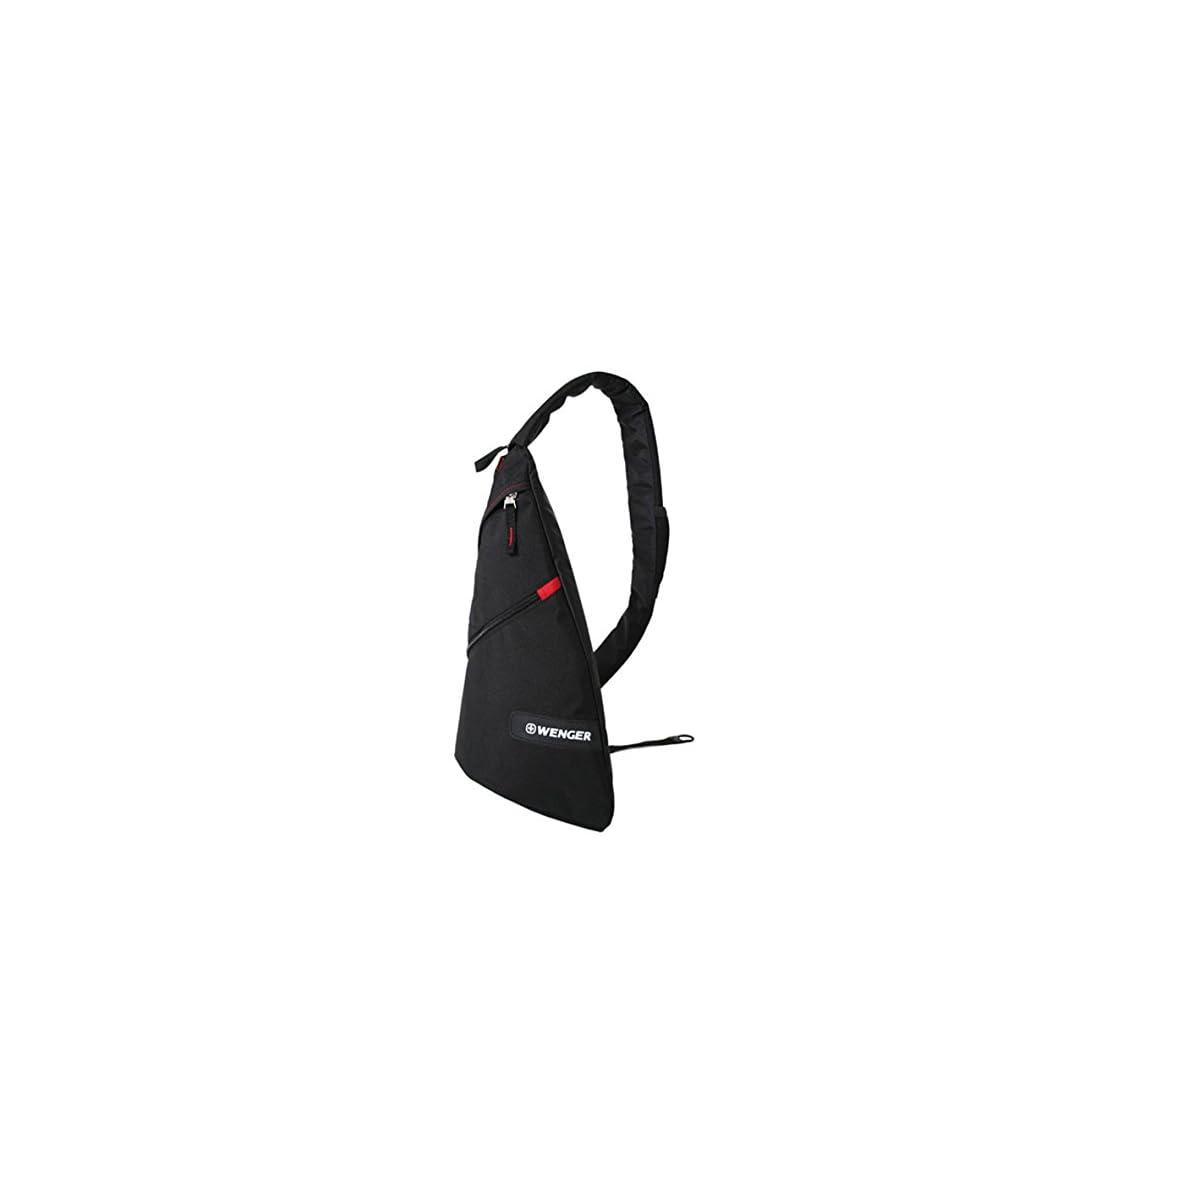 41IxQImWebL. SS1200  - Wenger Mochila Casual, 12 litros, negro (Negro) - WG18302130